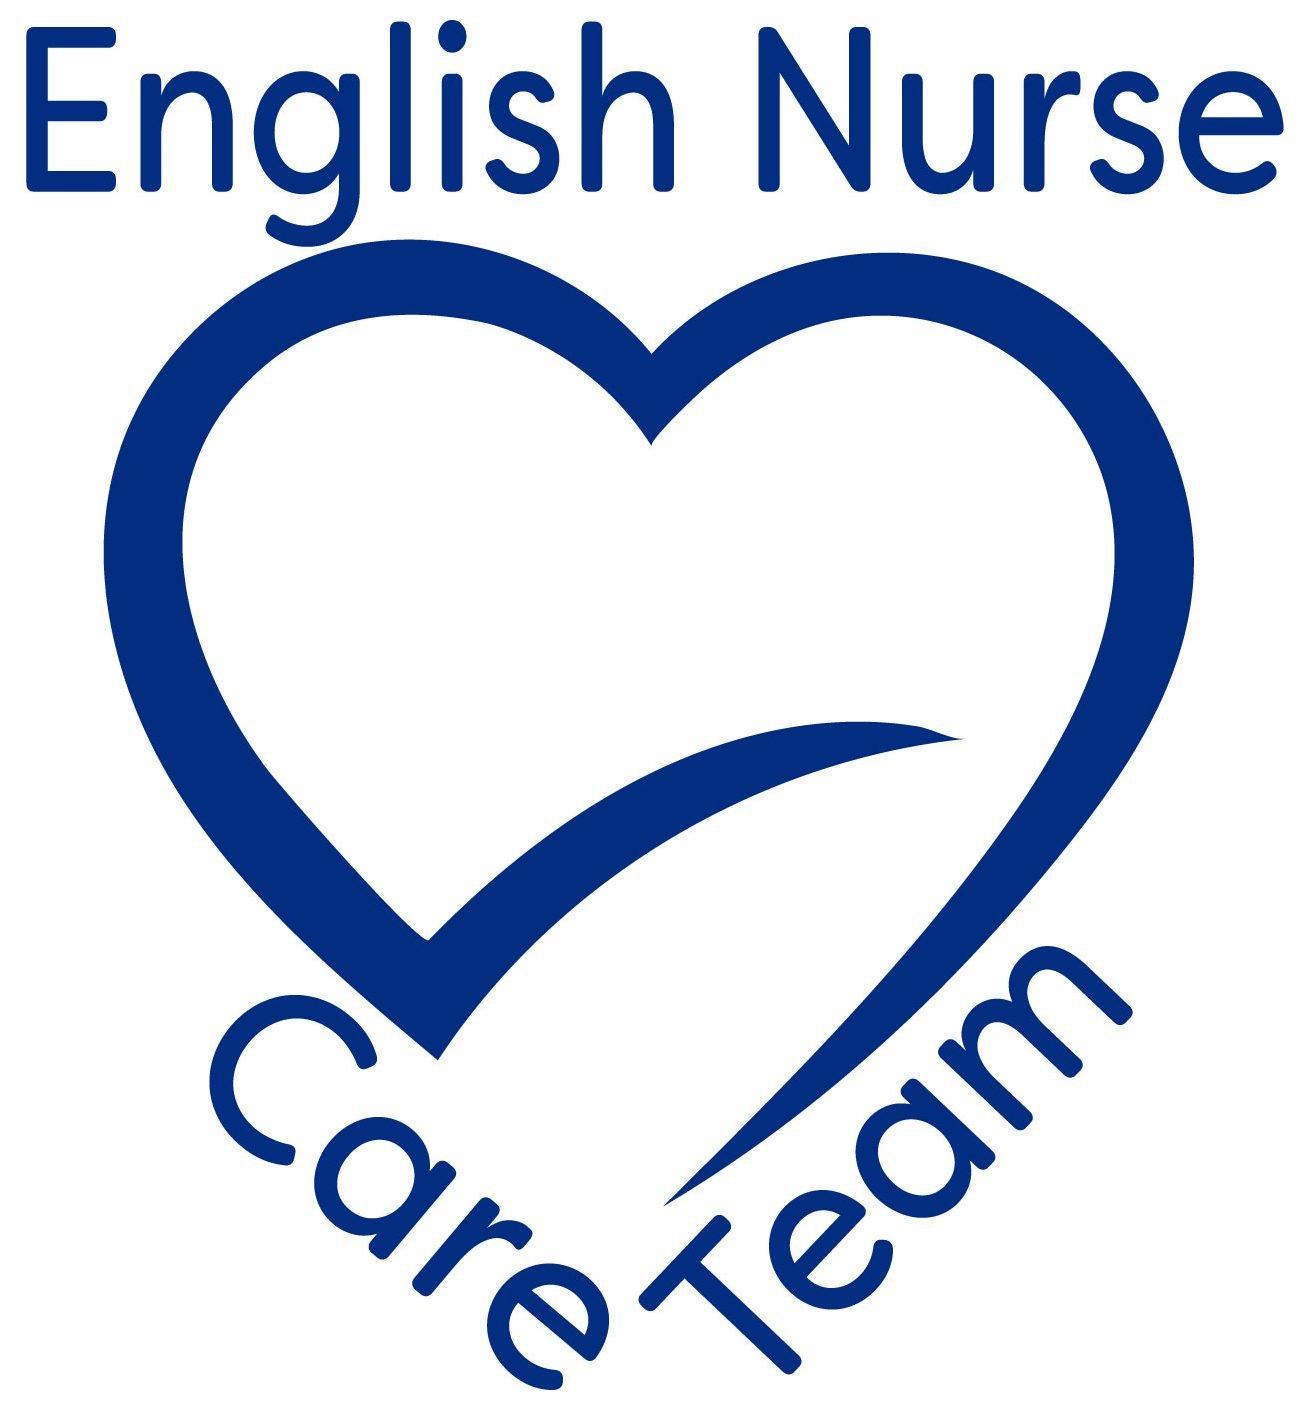 The English Nurse - Logo 1